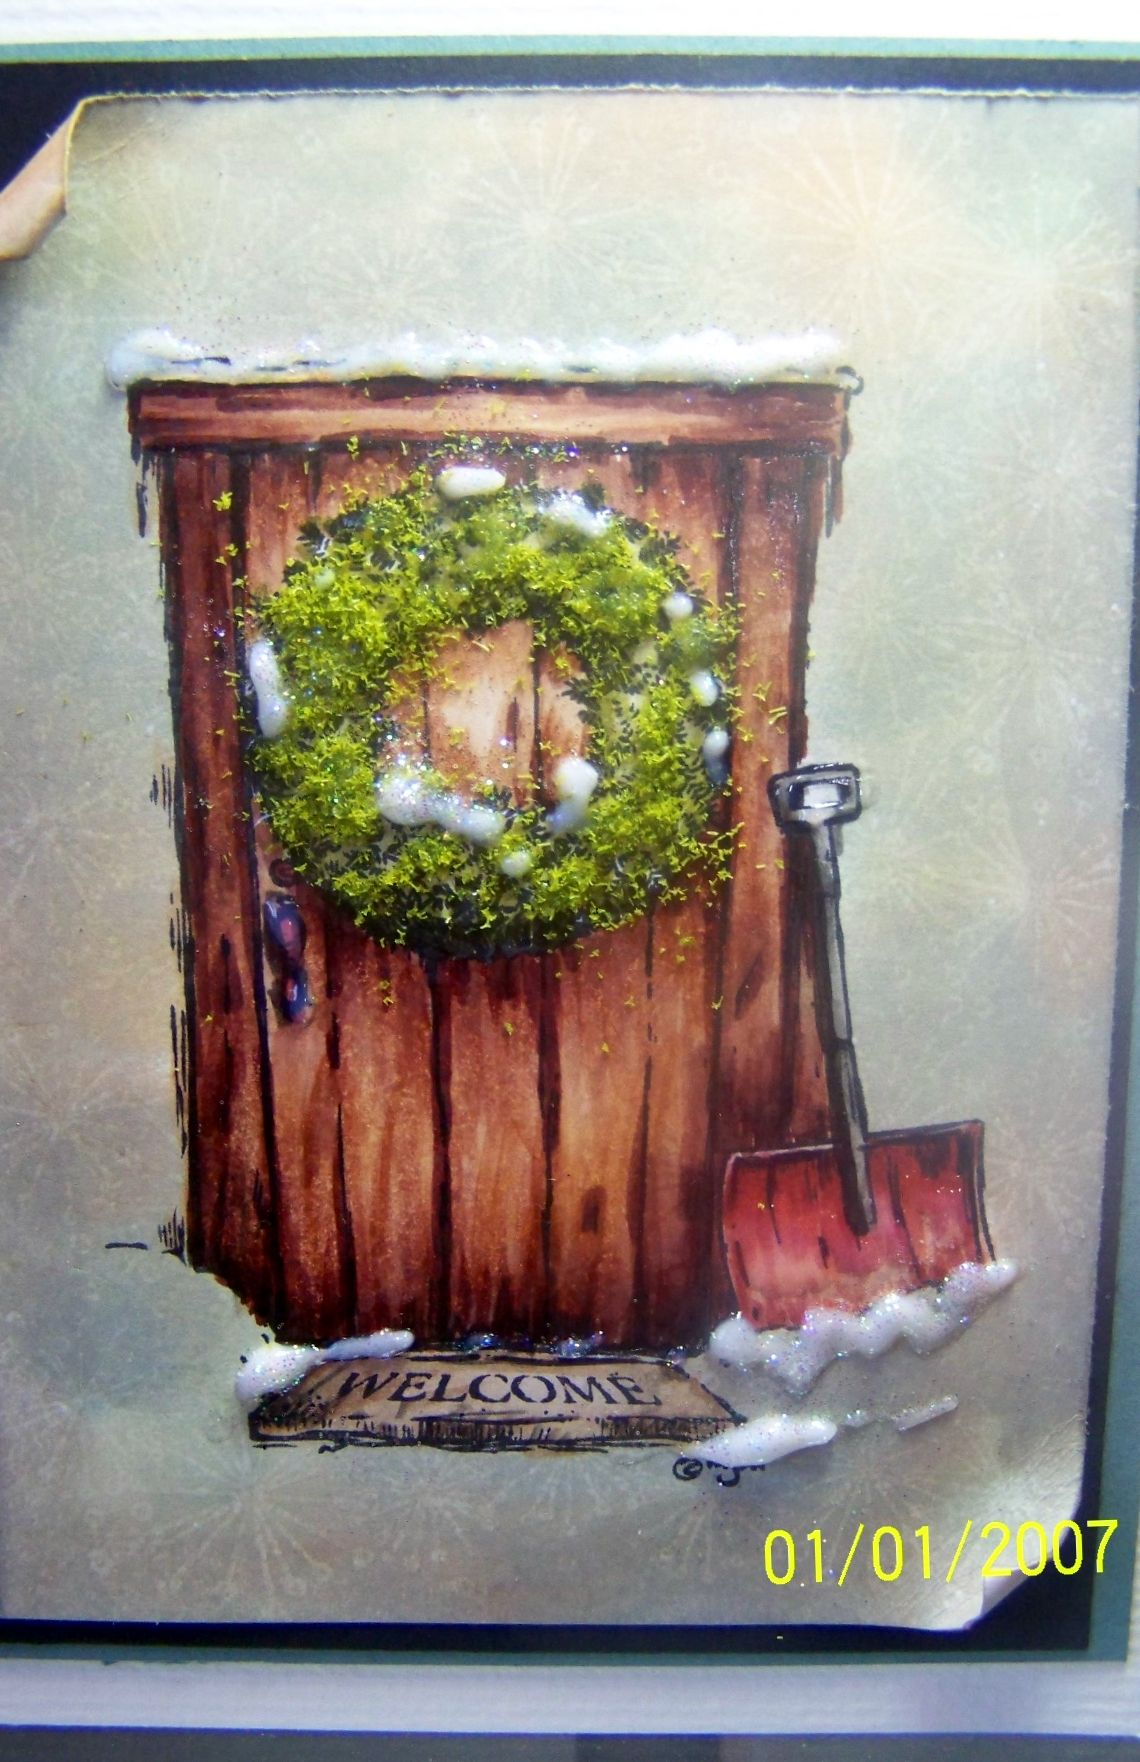 Scrapbook ideas christmas card - Scrapbook Ideas Christmas Card 16